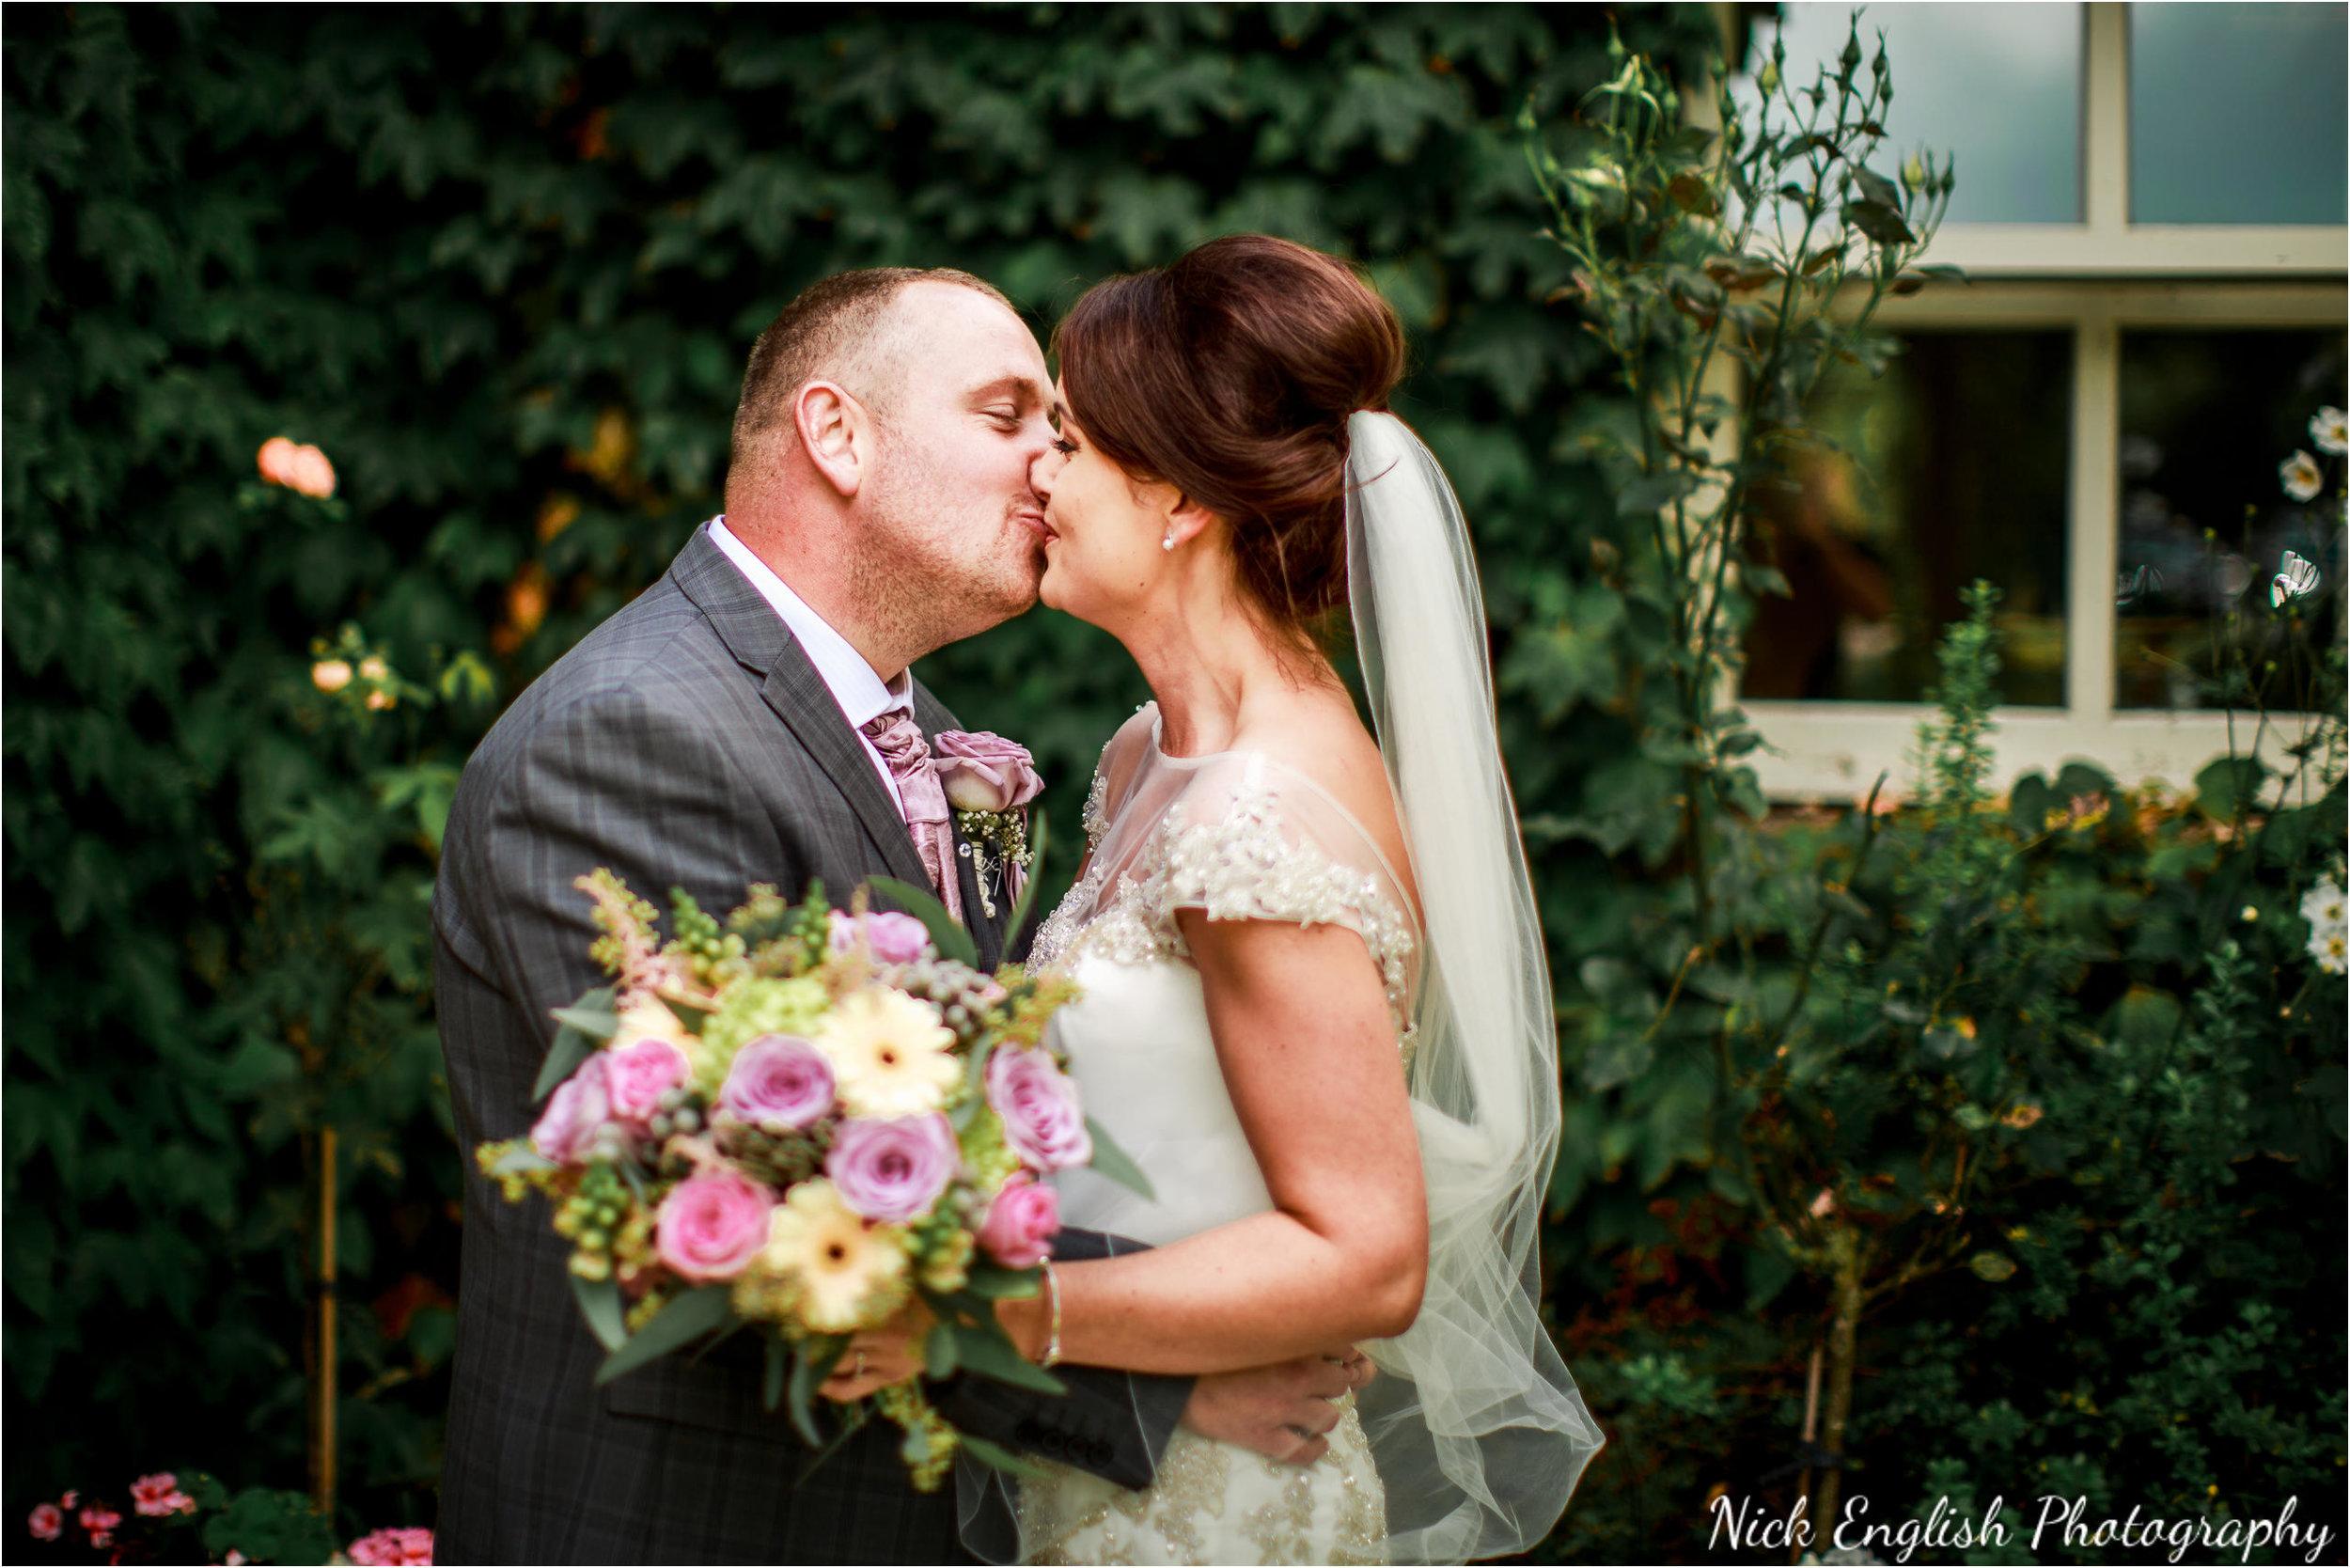 Stacey-Ash-Wedding-Photographs-Stanley-House-Preston-Lancashire-129.jpg